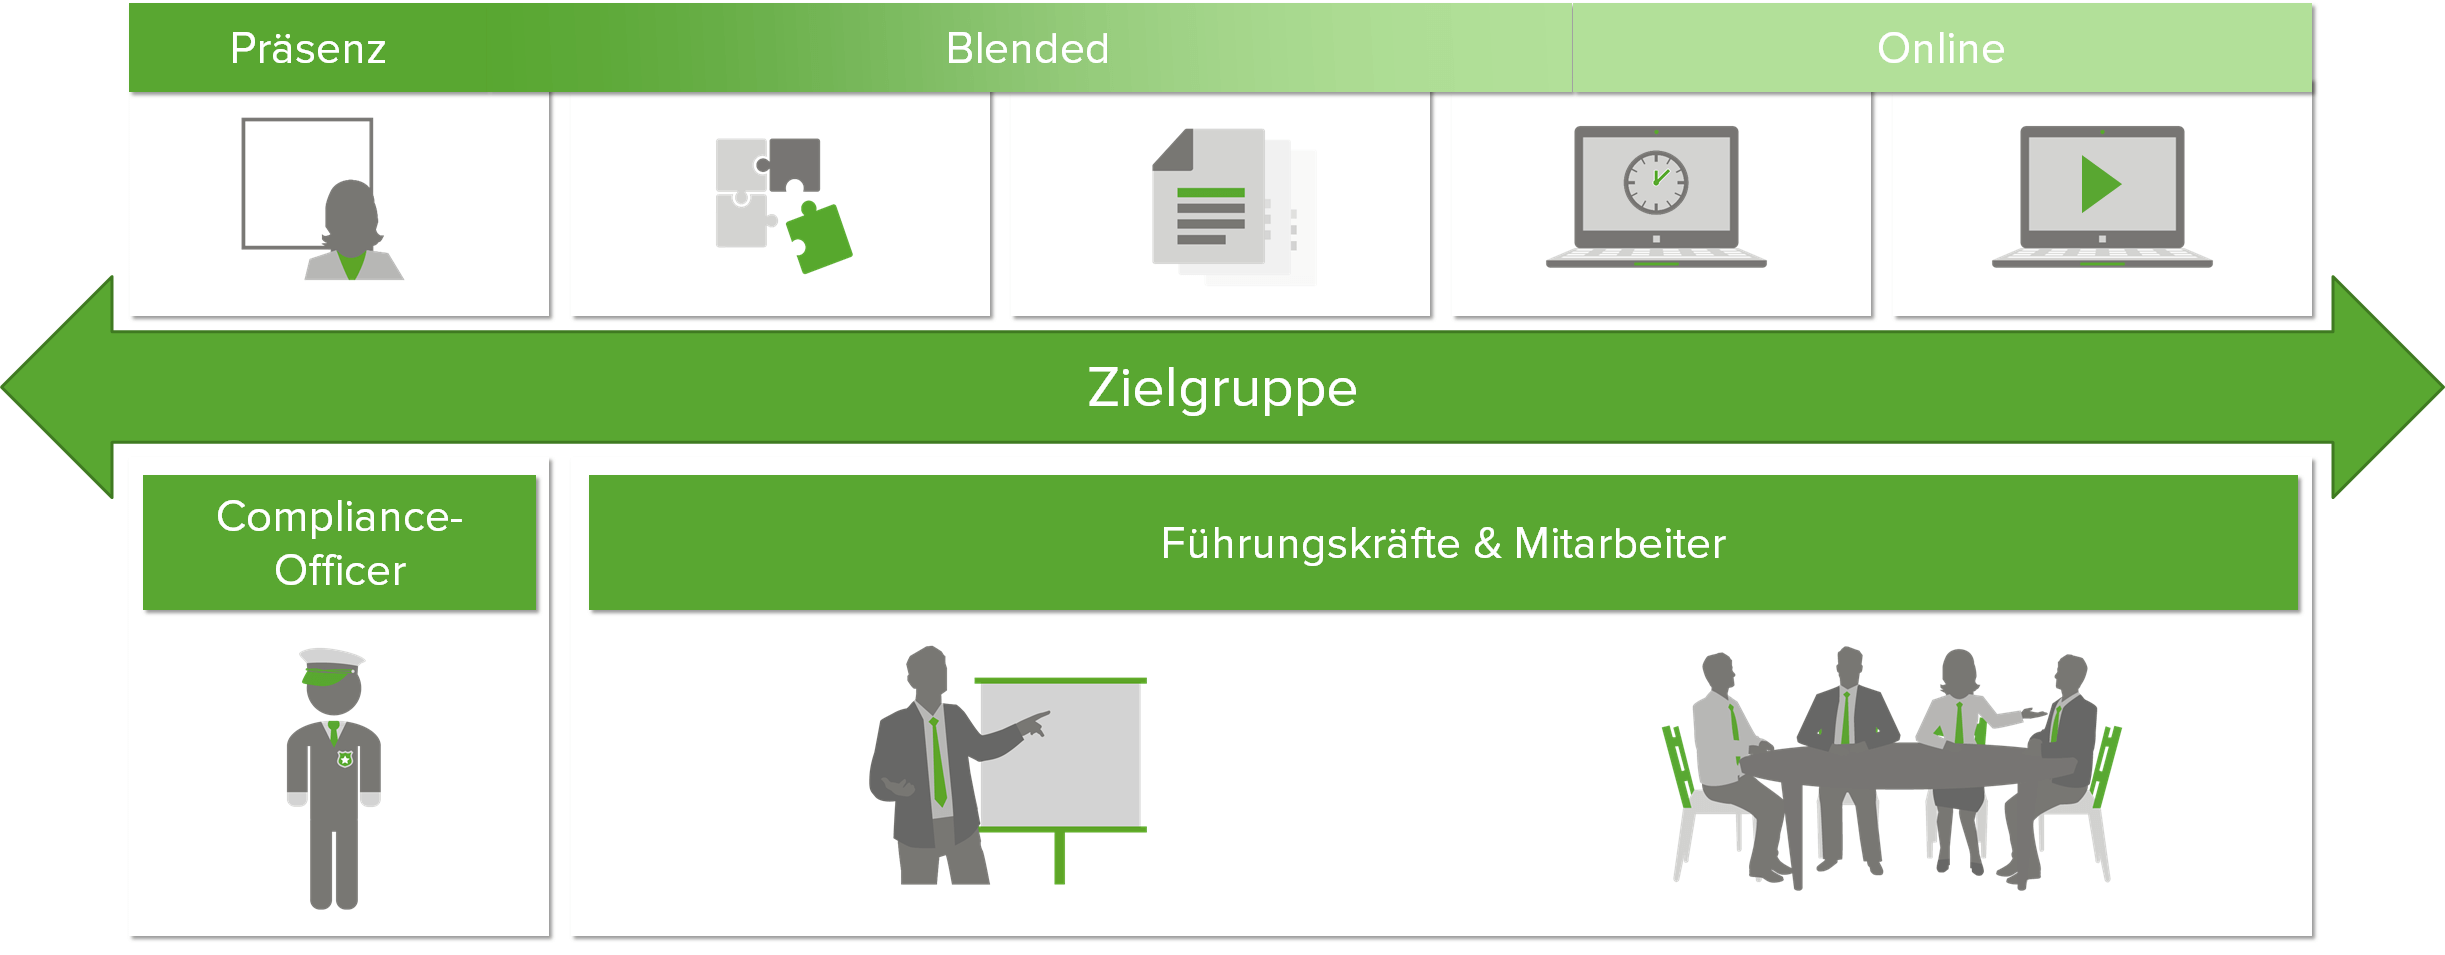 Zielgruppen von Compliance-Trainings